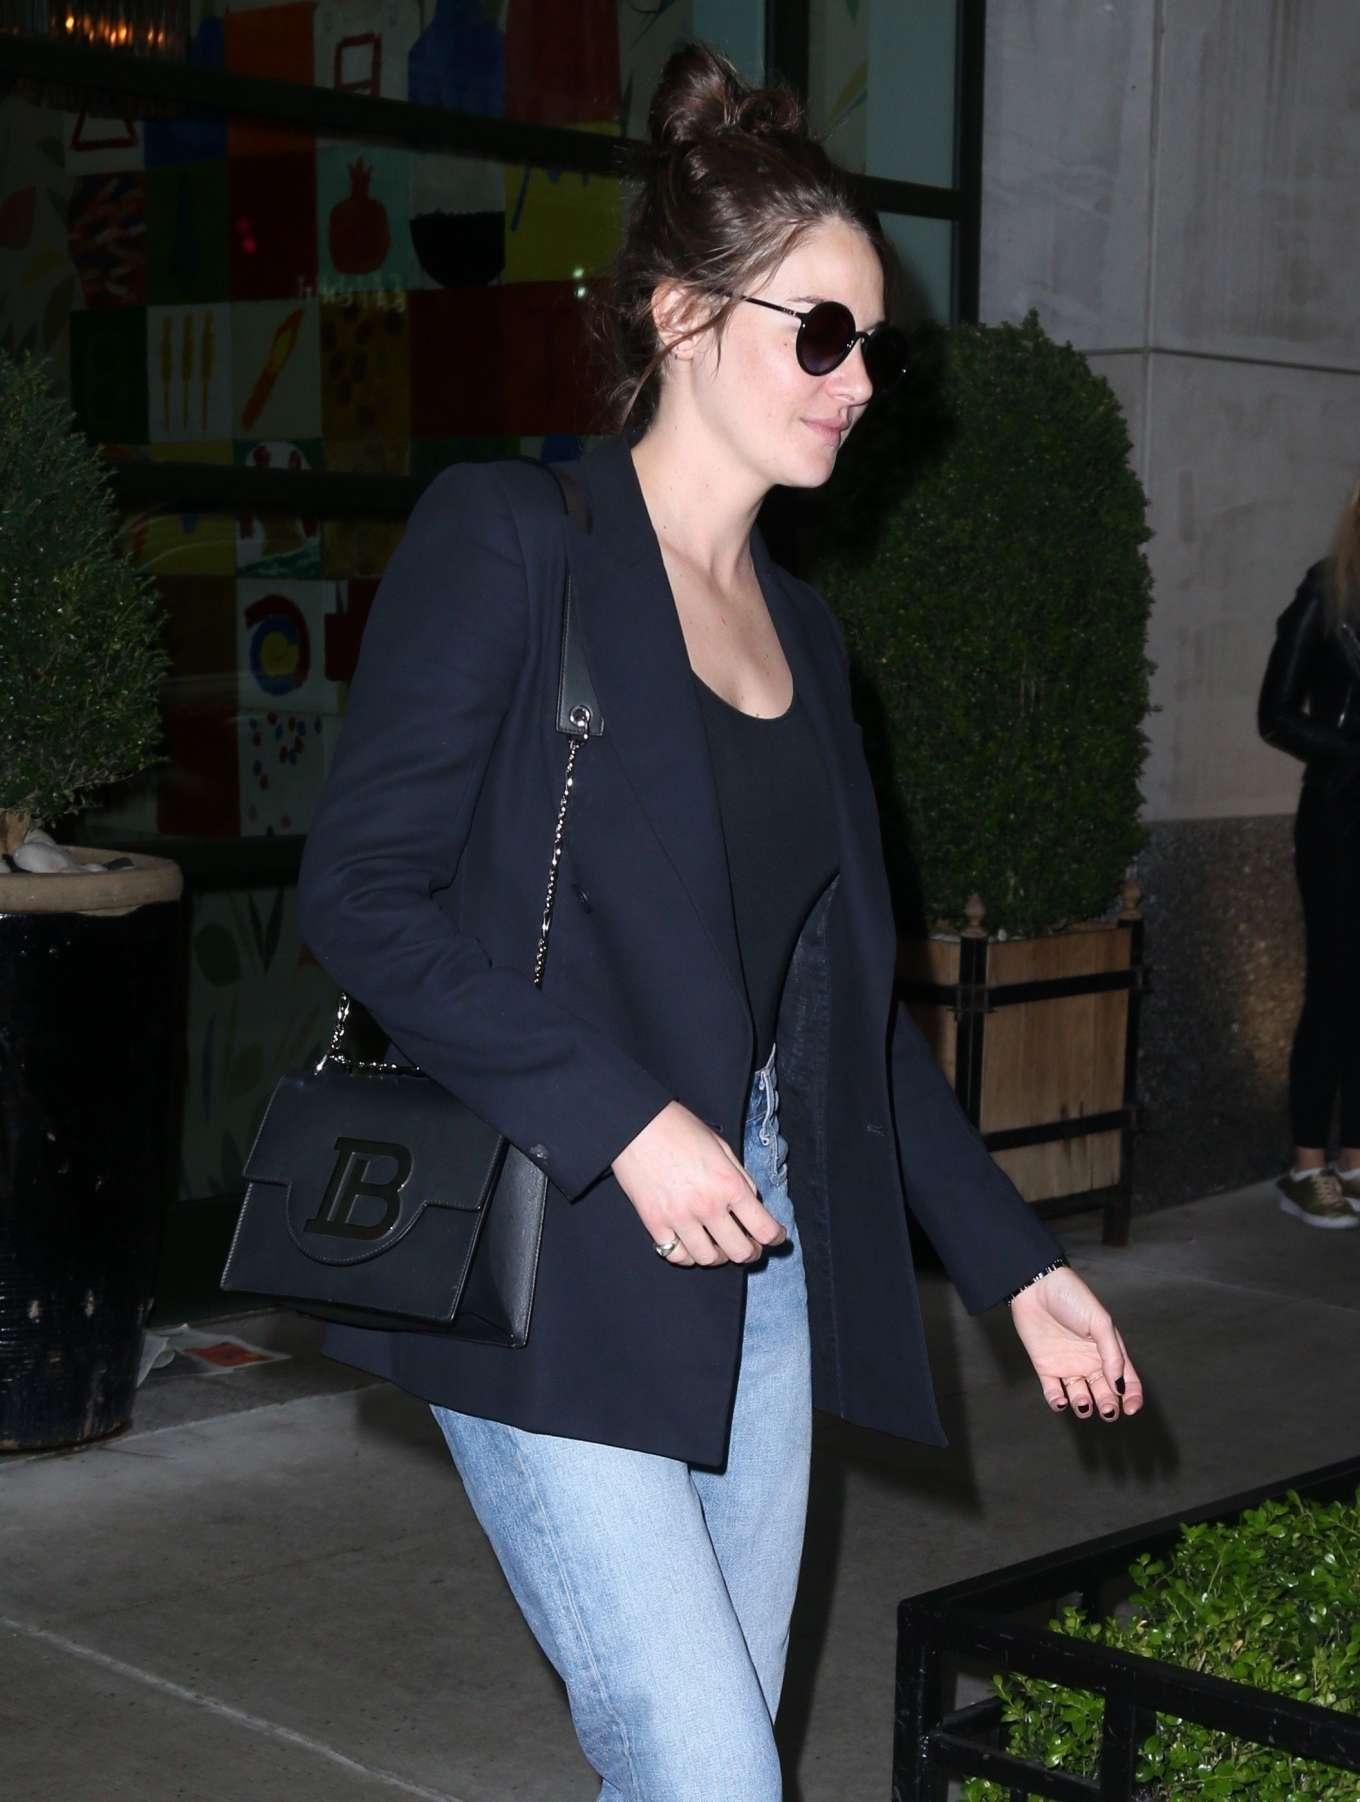 Shailene Woodley 2019 : Shailene Woodley in a Blue Blazer and Jeans-17